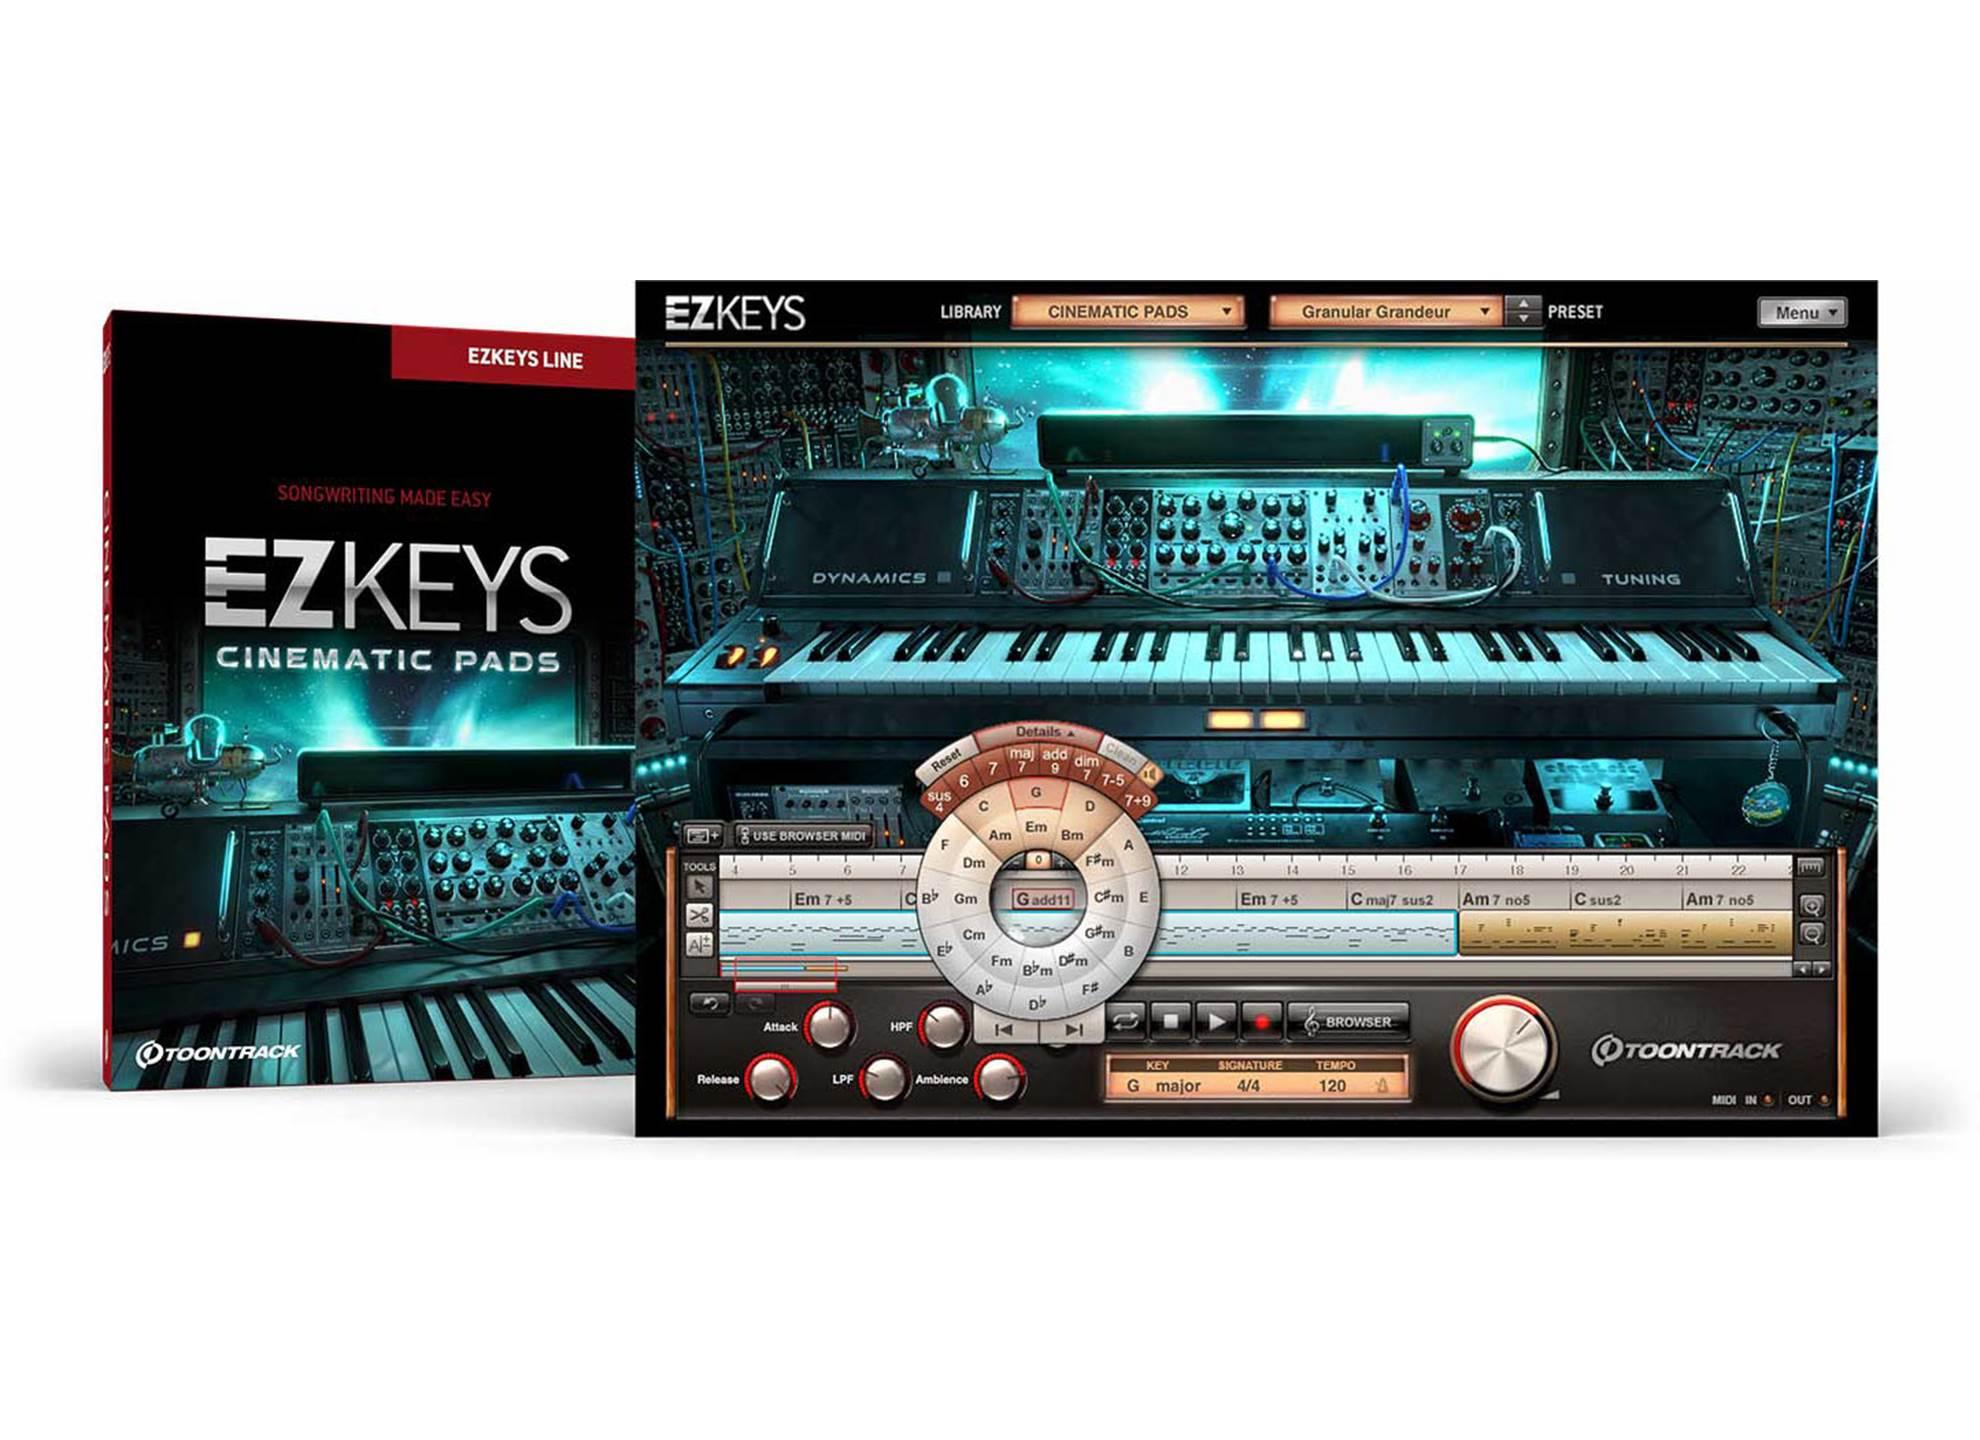 EZkeys Cinematic Pads